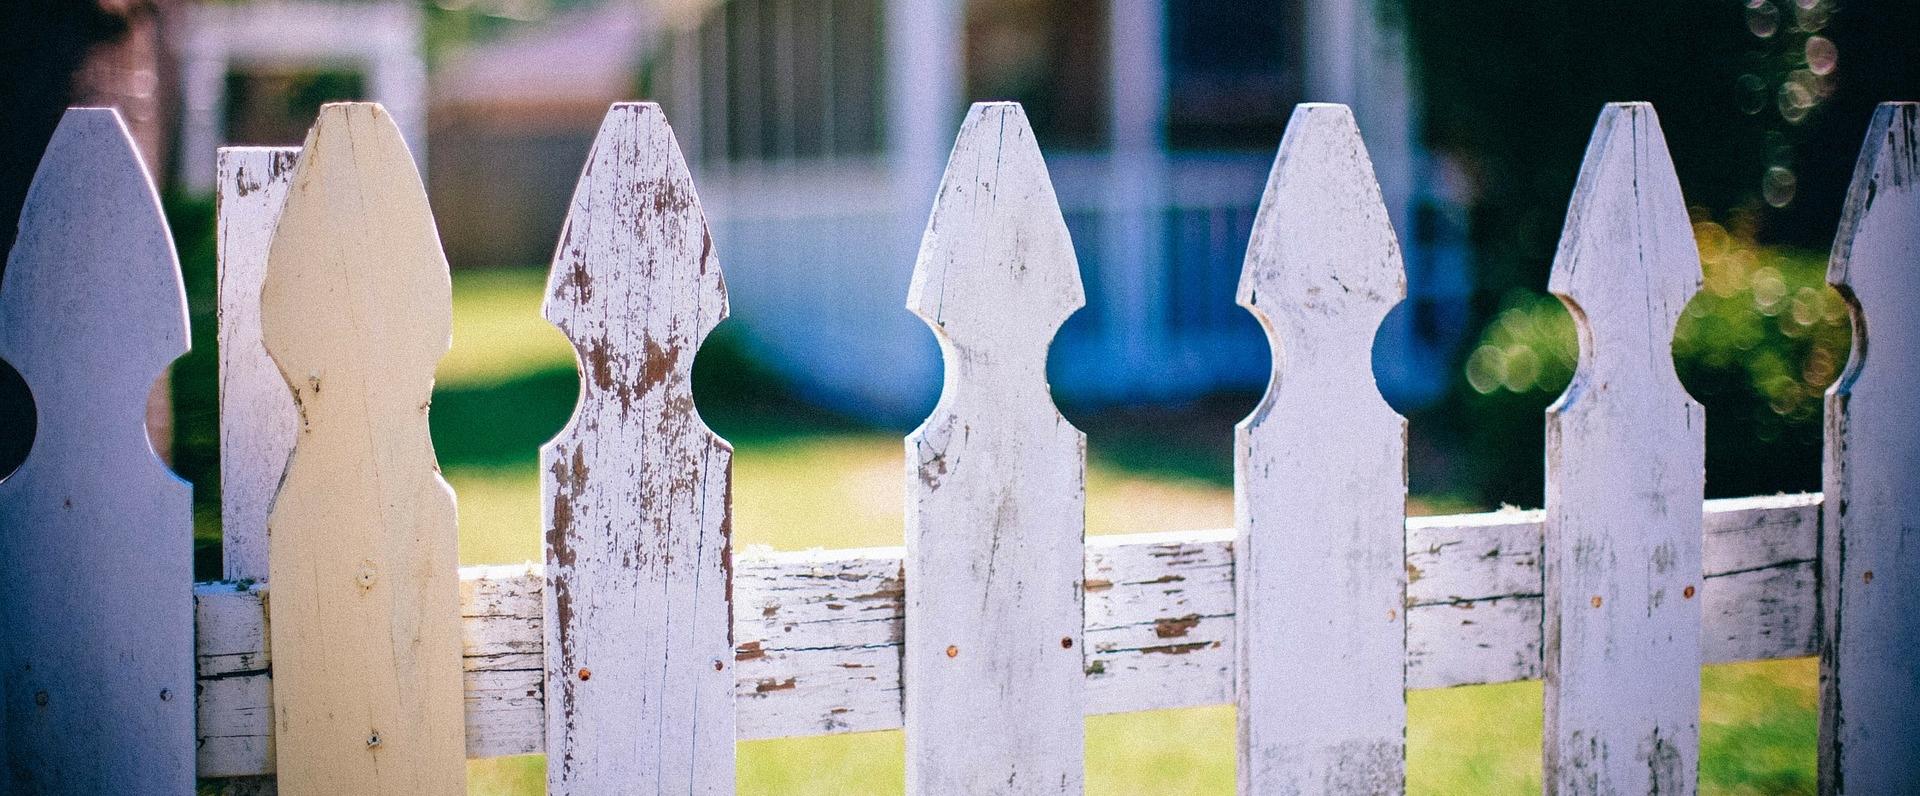 picket-fences.jpg